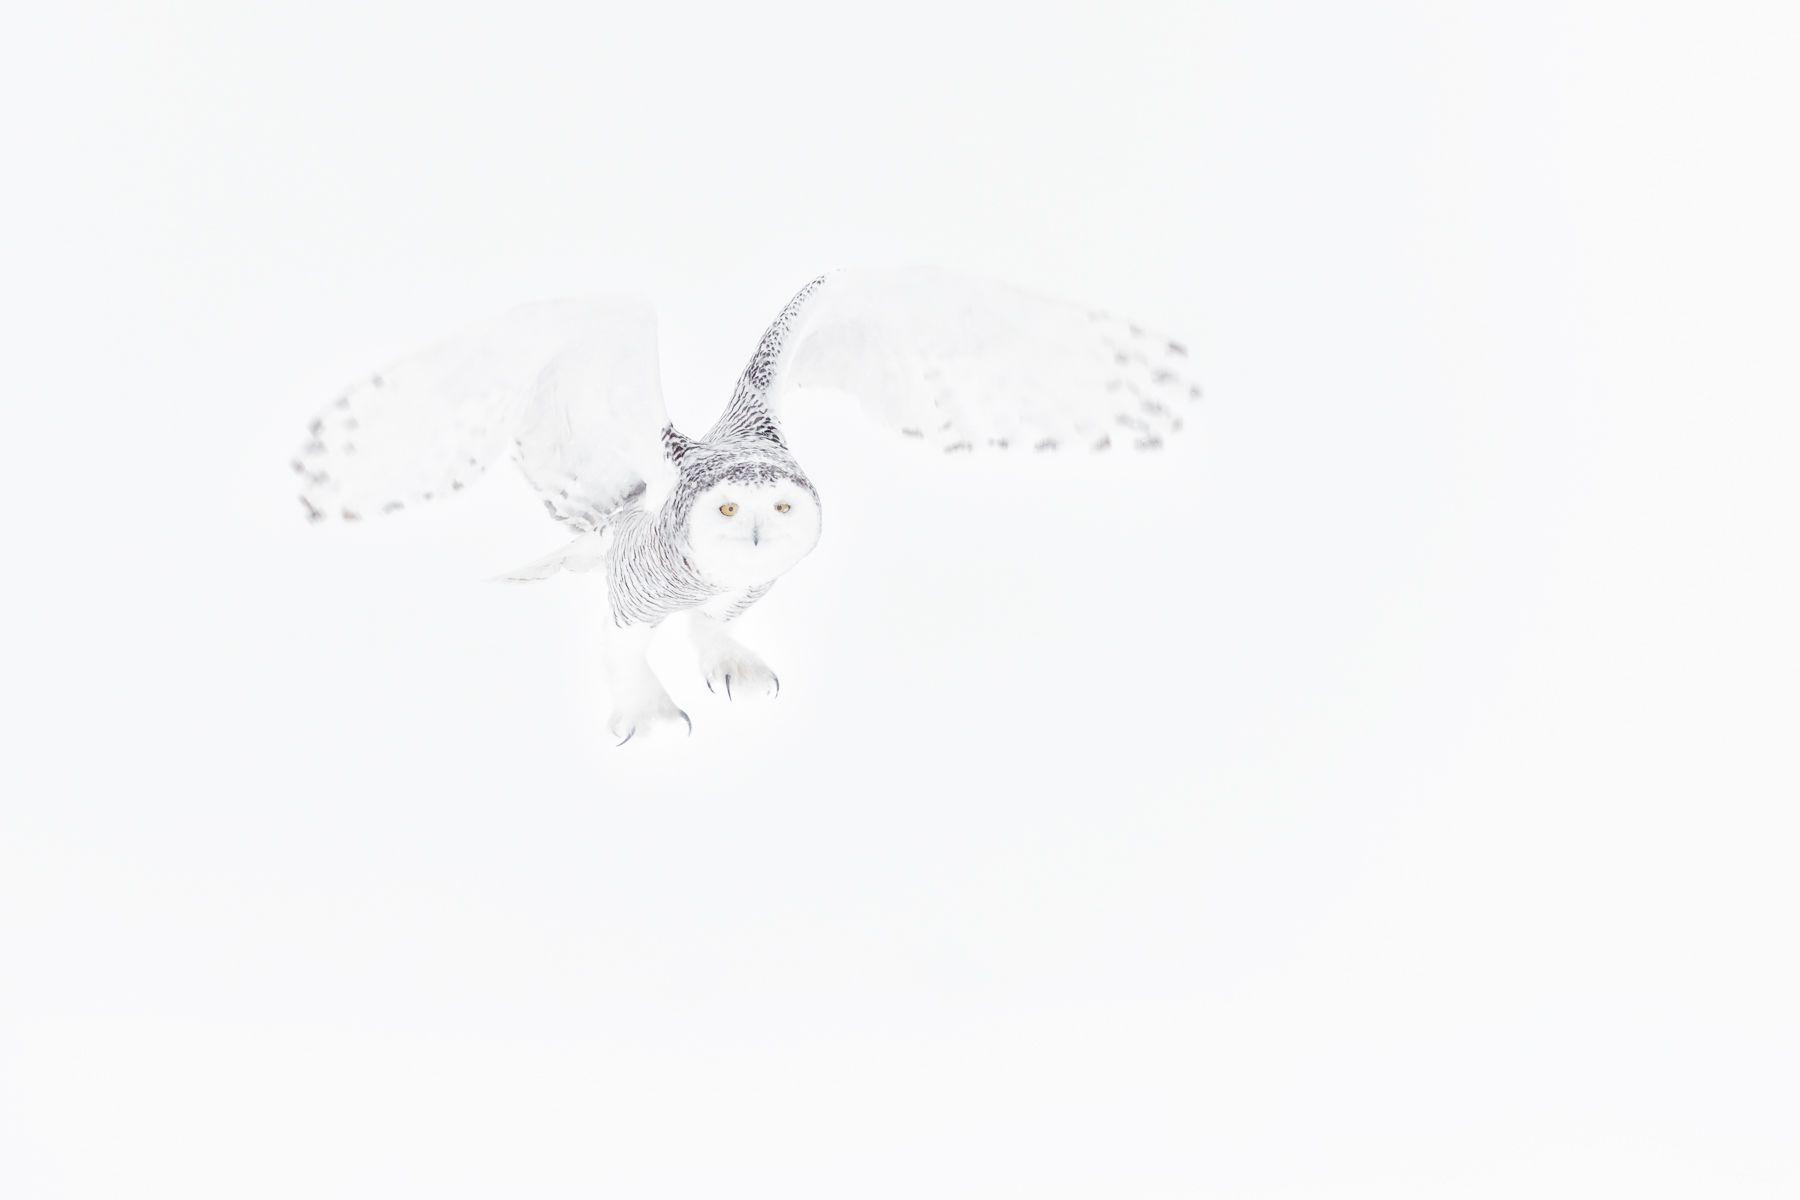 Snowy Owl Photograph by Joshua Holko